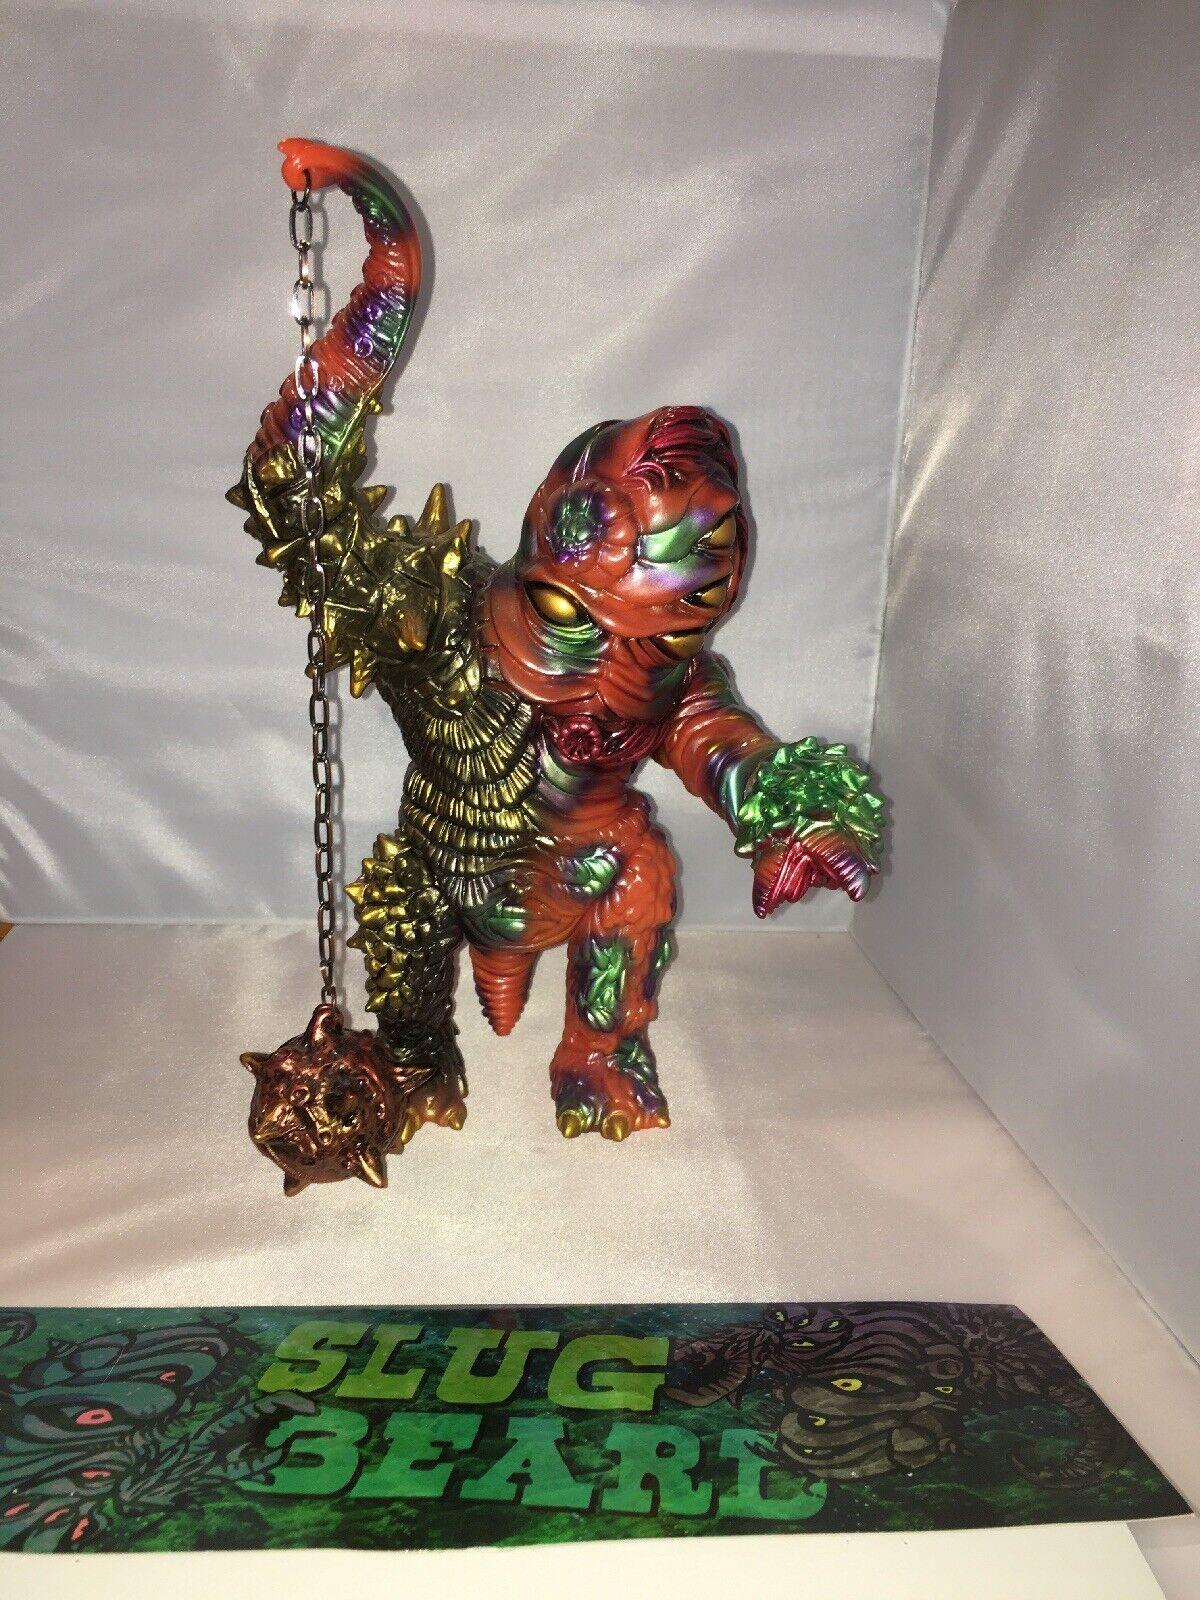 Paul Kaiju x Toy Art Art Art Gallery Slugbeard Astro Jungle Version Kaiju Sofubi 4fa479